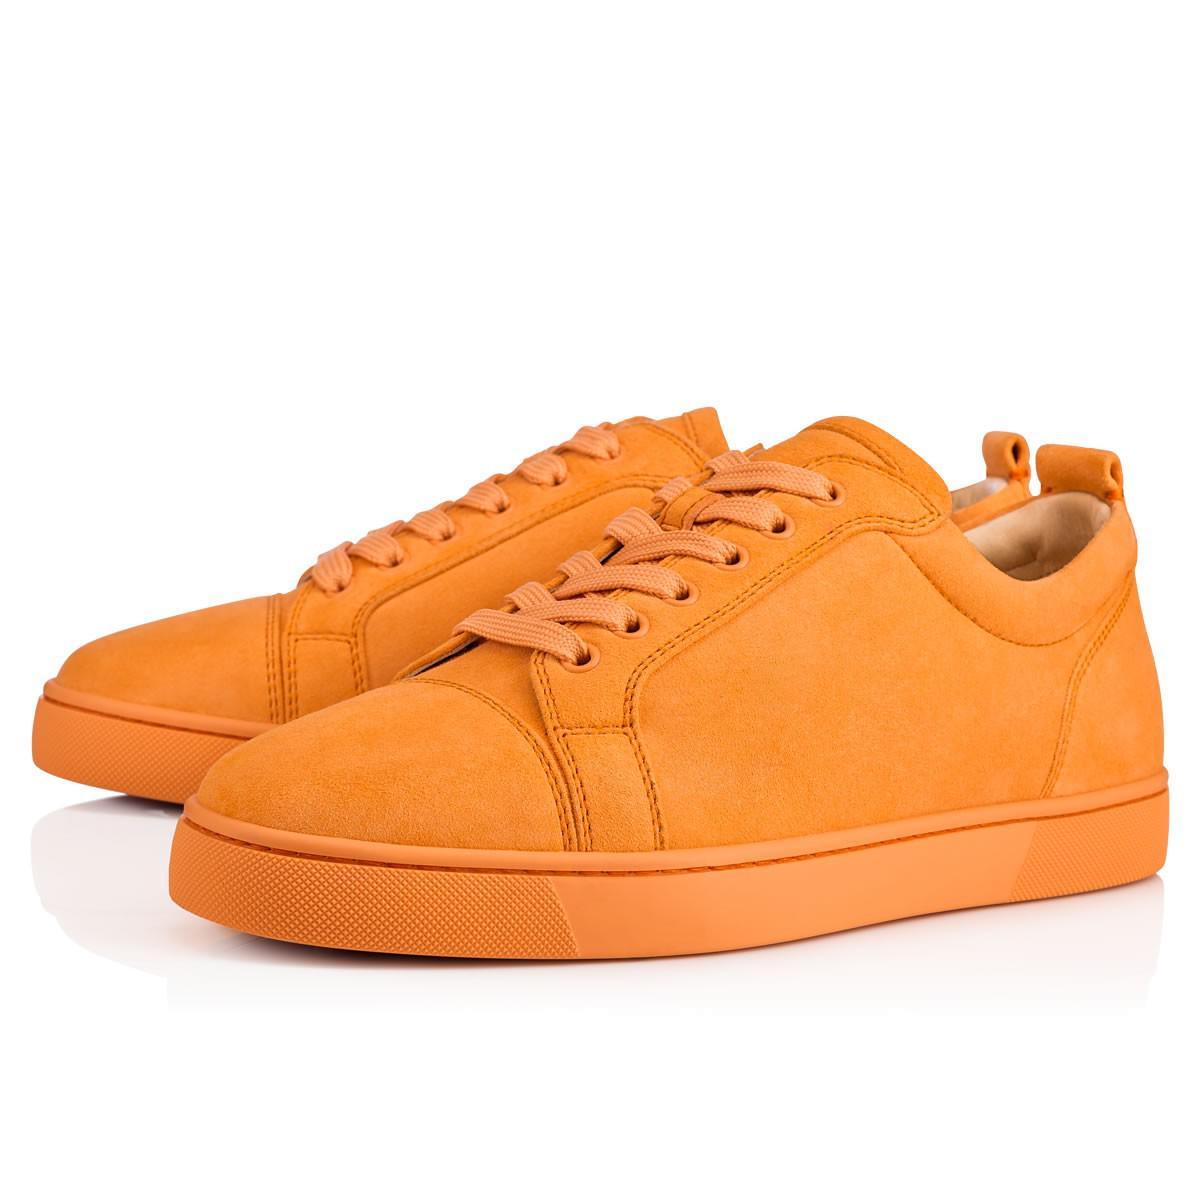 b755c00d76d Lyst - Christian Louboutin Louis Junior Flat Veau Velours in Orange ...